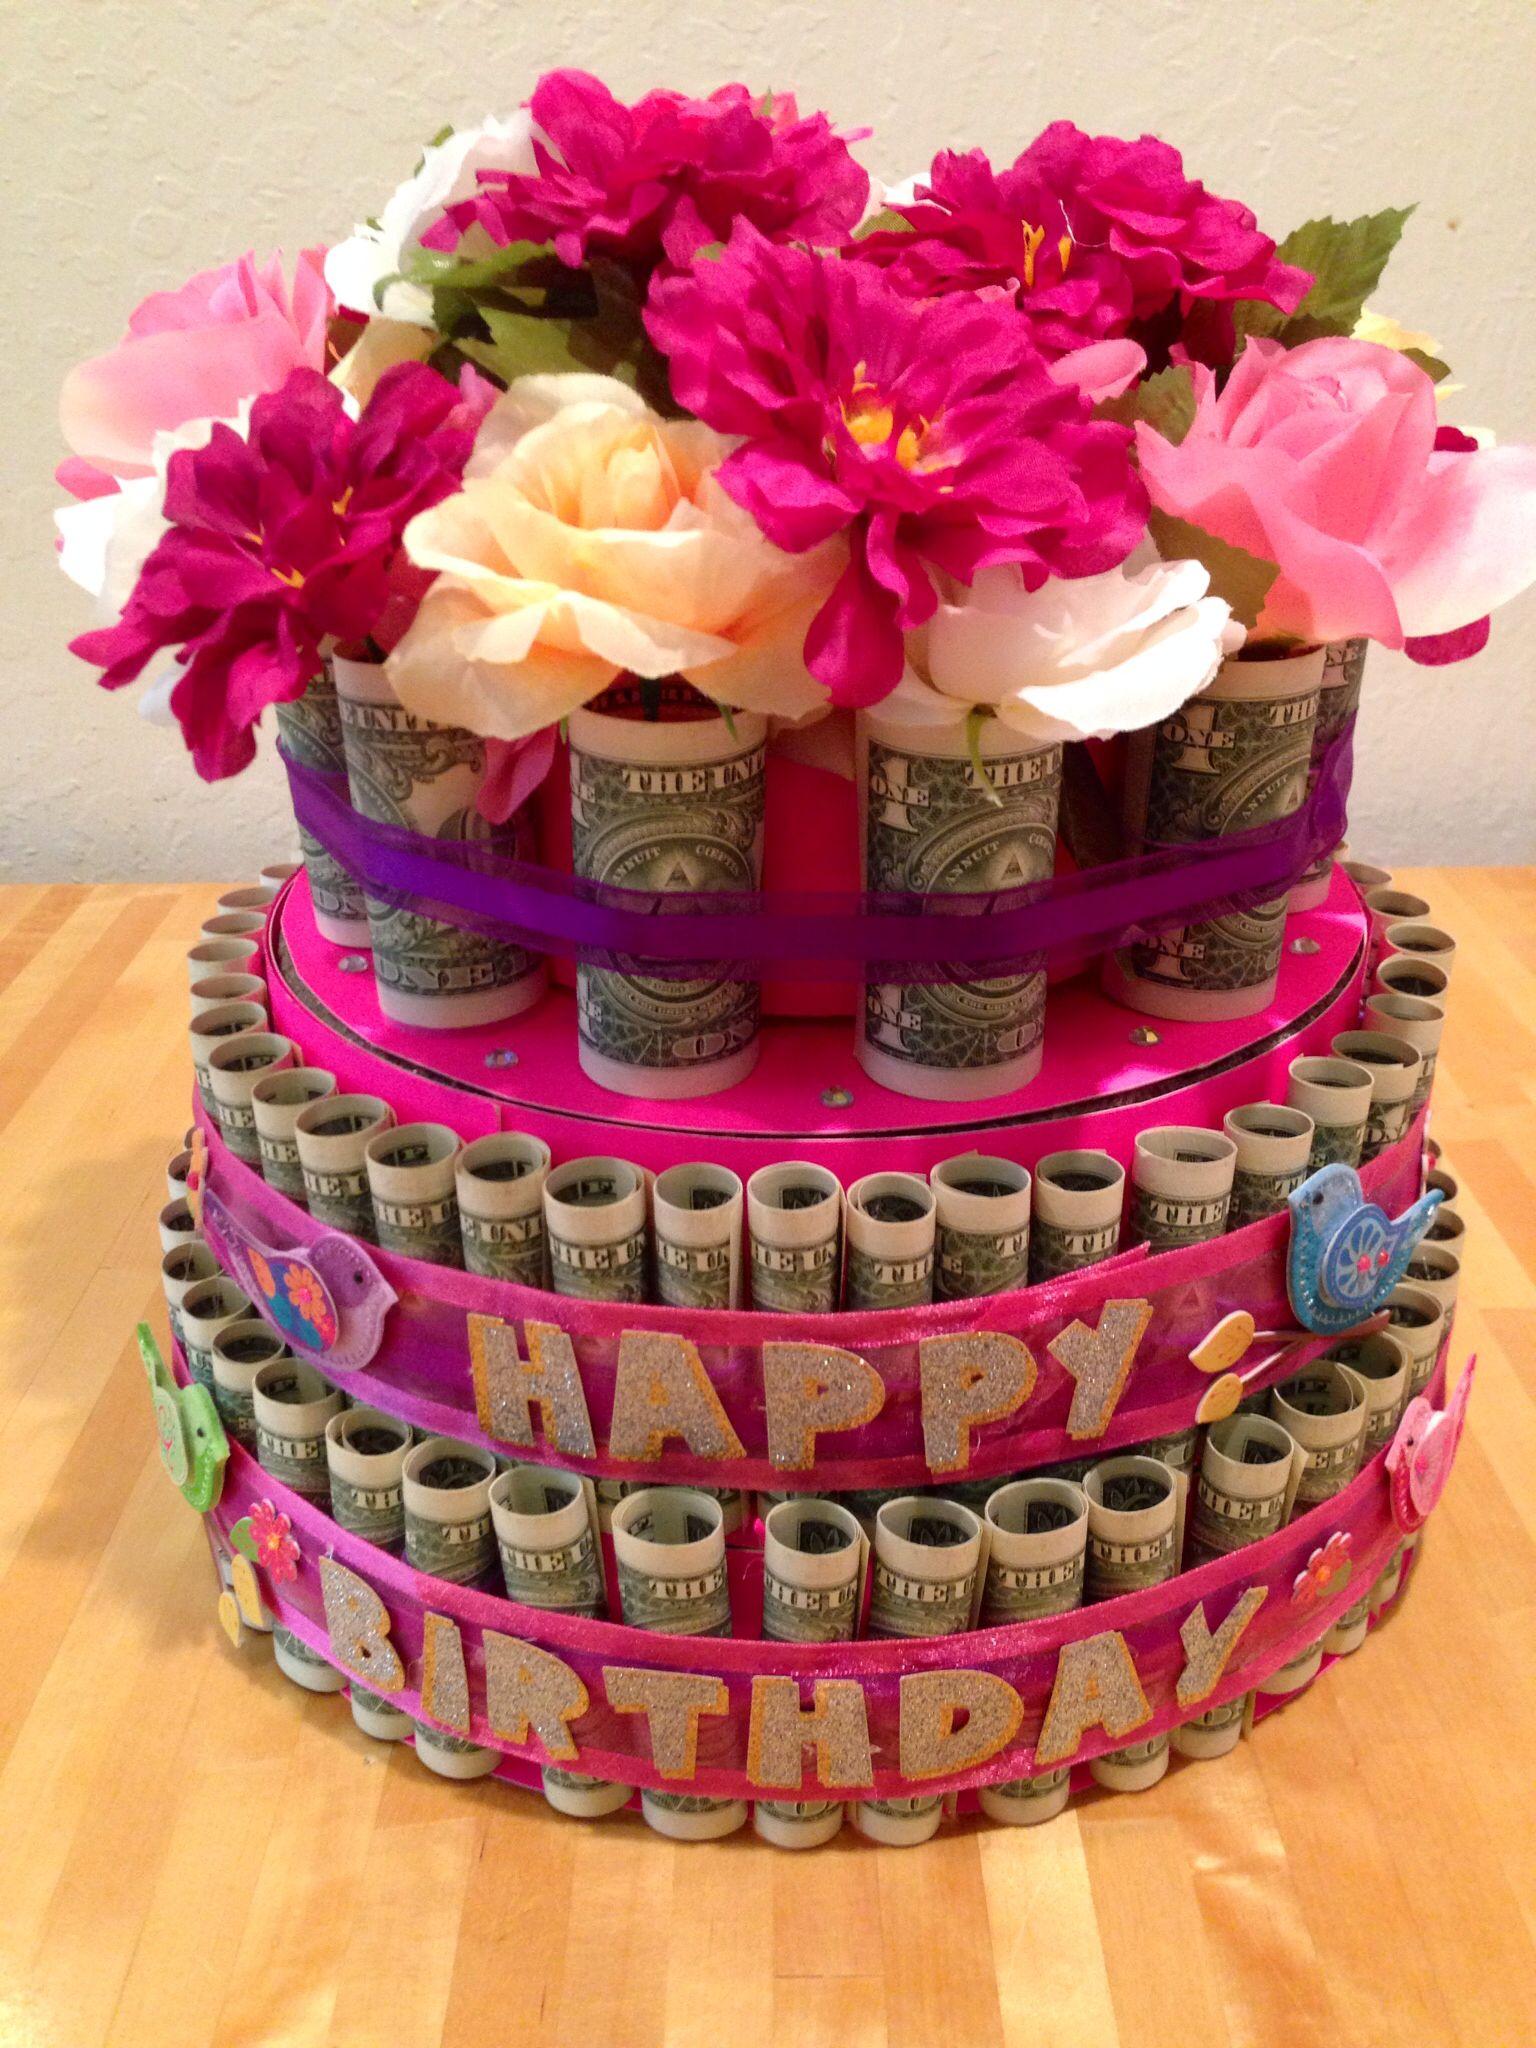 Dollar Bill Cake | Dollar Bill Cake | Money birthday cake ... - photo#38